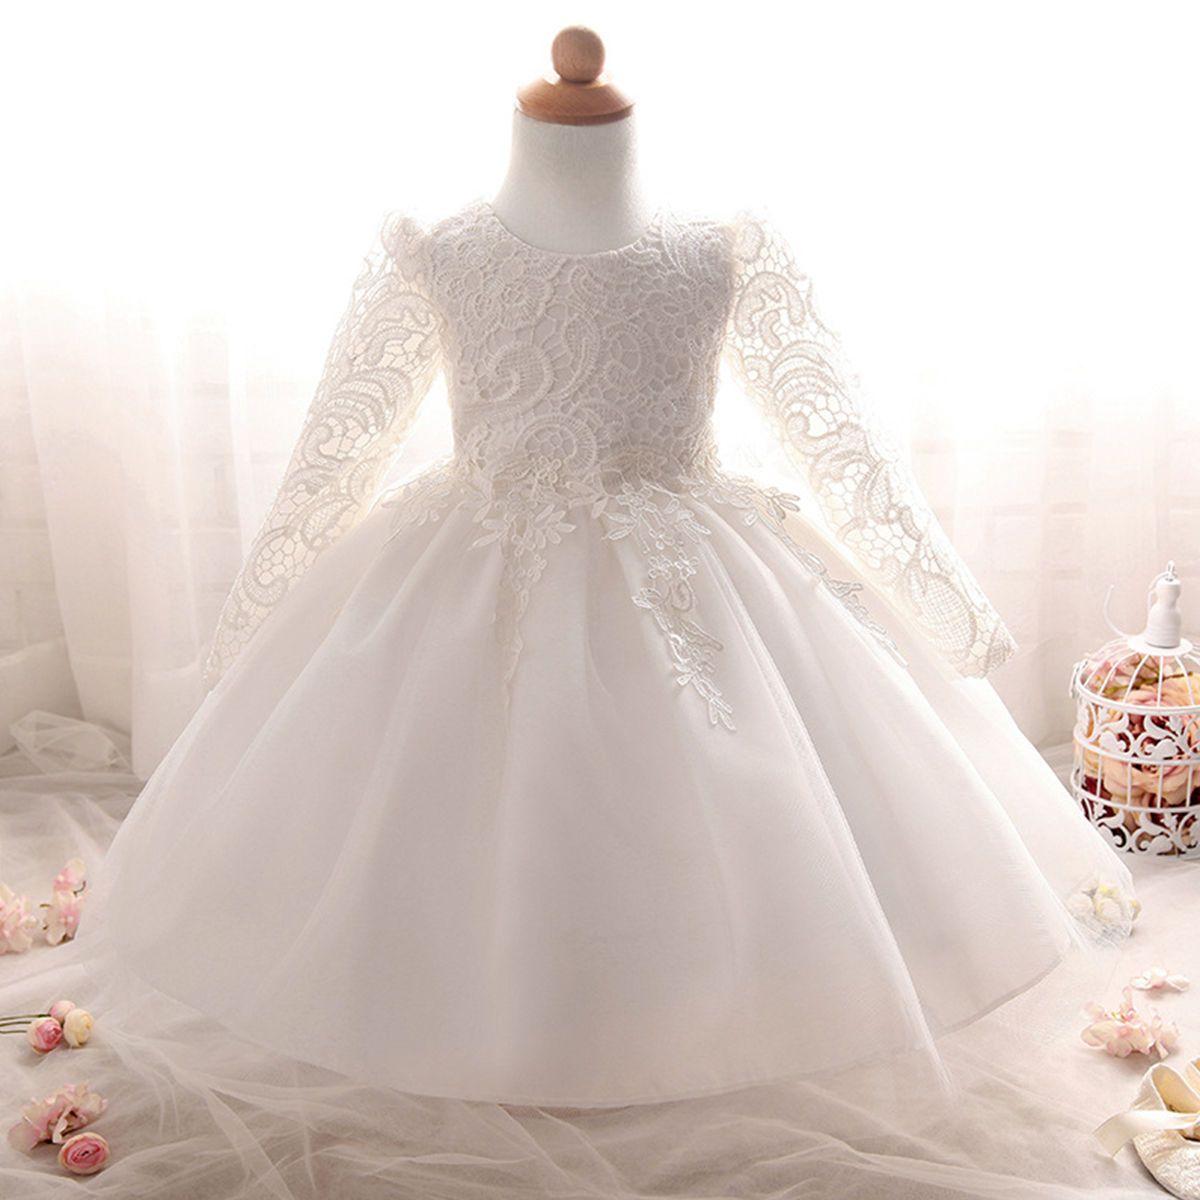 02f4d1467266 Flower Toddler Baby Girl Lace Dress Long Sleeve Princess Wedding ...